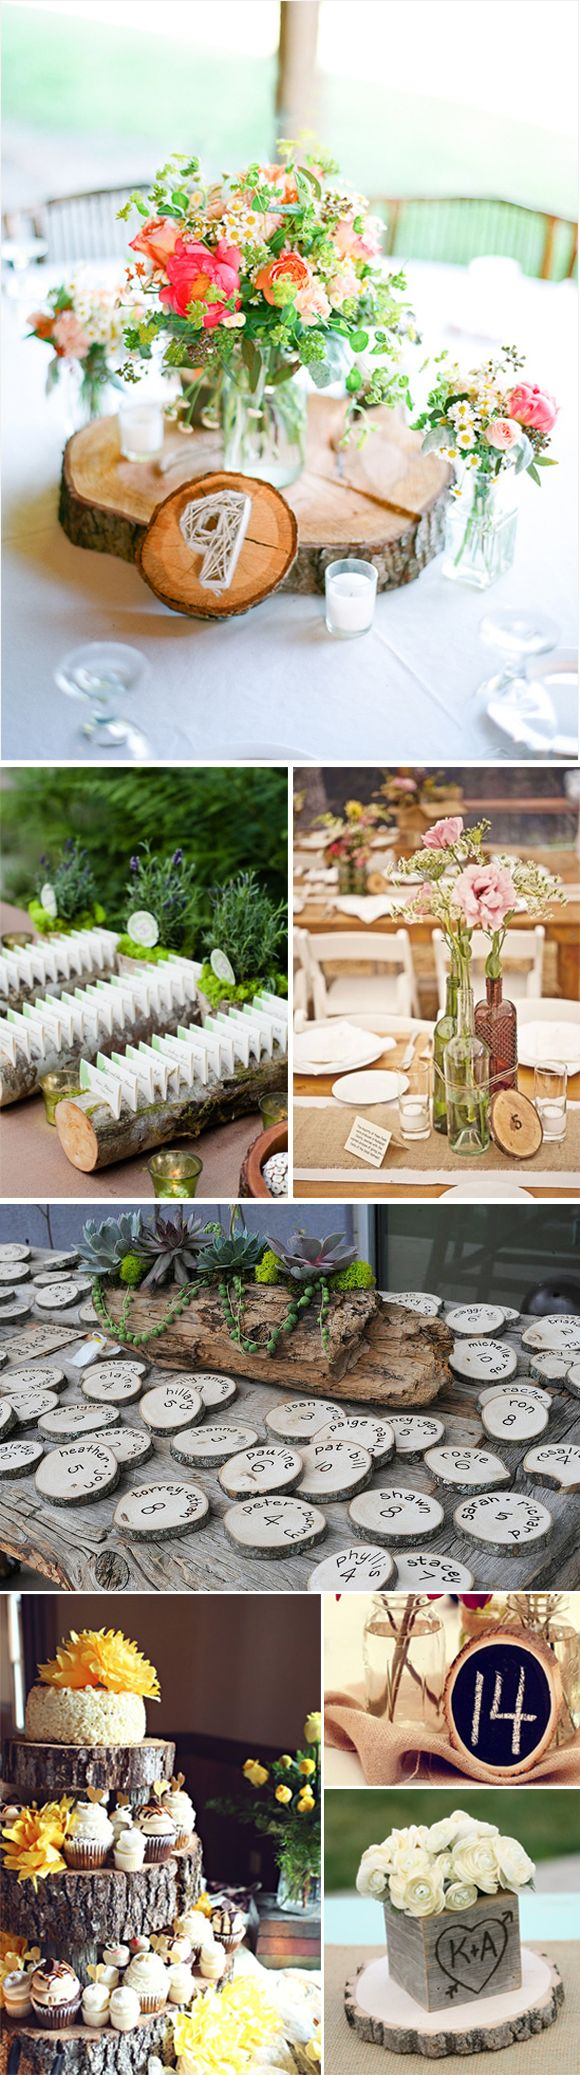 Decoracion de boda con troncos de madera ideas para tu boda arreglos boda mer pinterest - Tronco madera decoracion ...